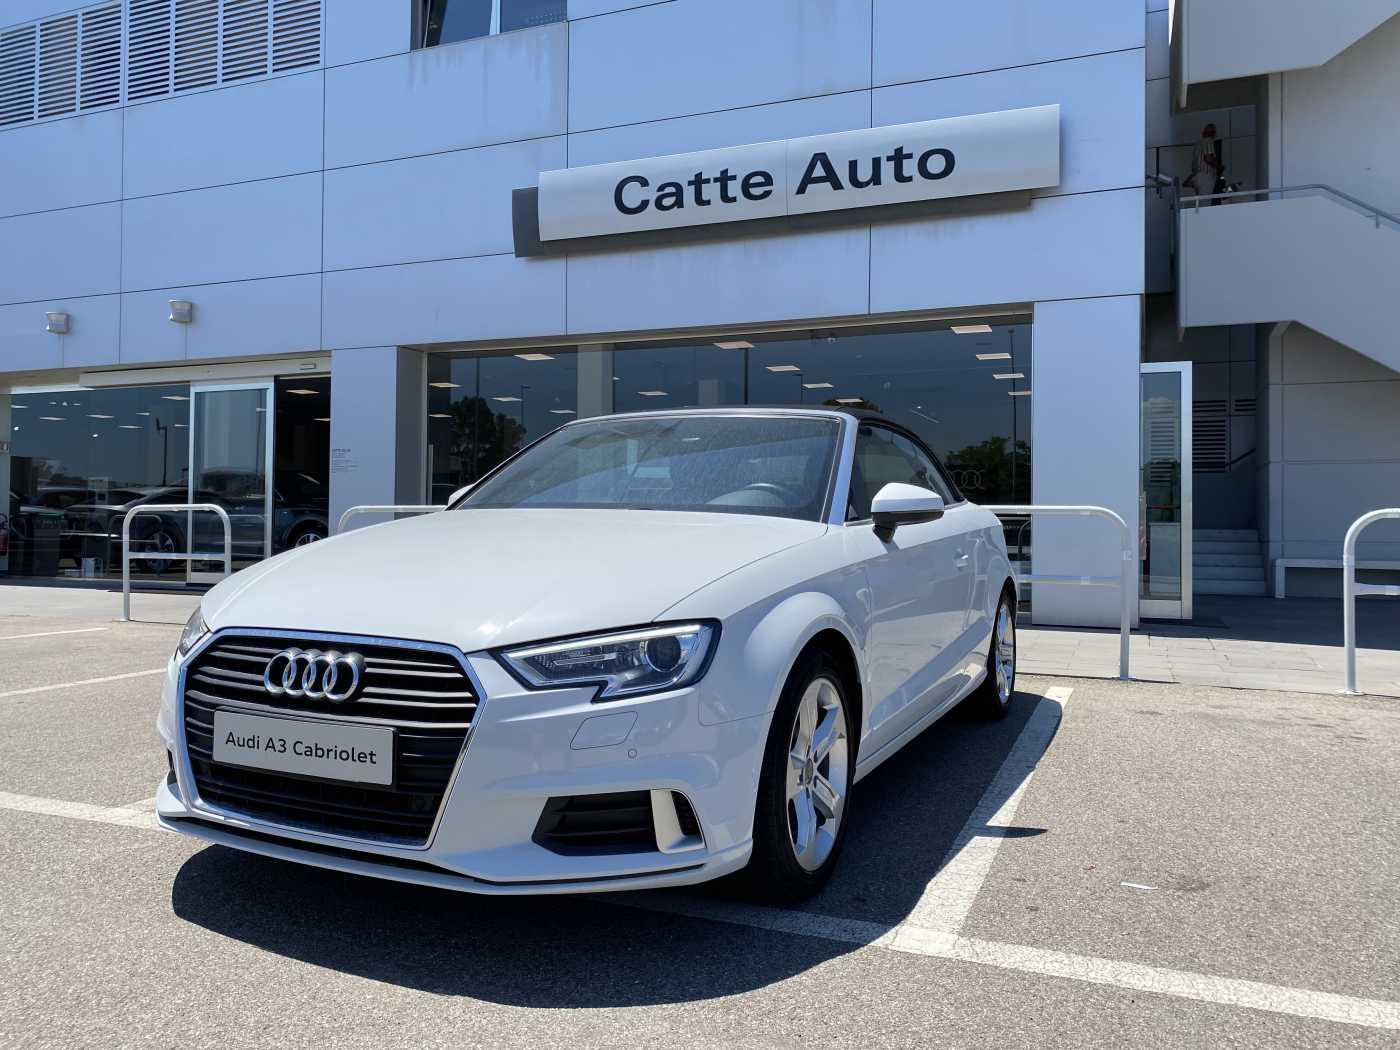 Audi - A3 3ª serie usata in Sardegna - Concessionaria ufficiale Audi Catte Auto Cagliari